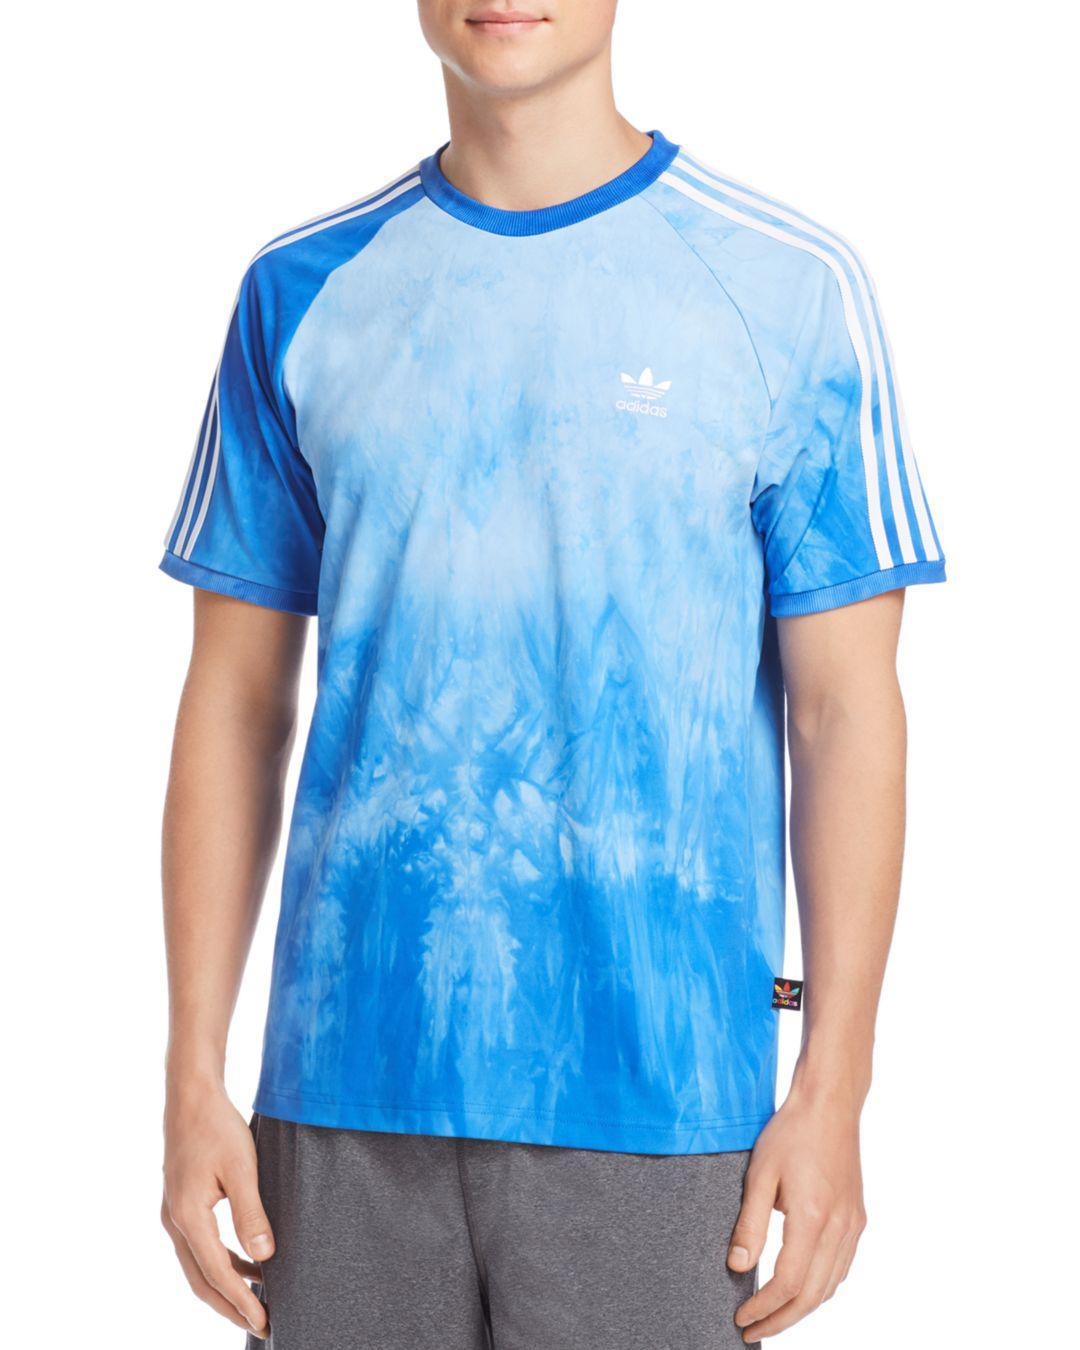 3a980e9a21199 adidas Originals Hu Holi Tie Dye Tee in Blue for Men - Lyst